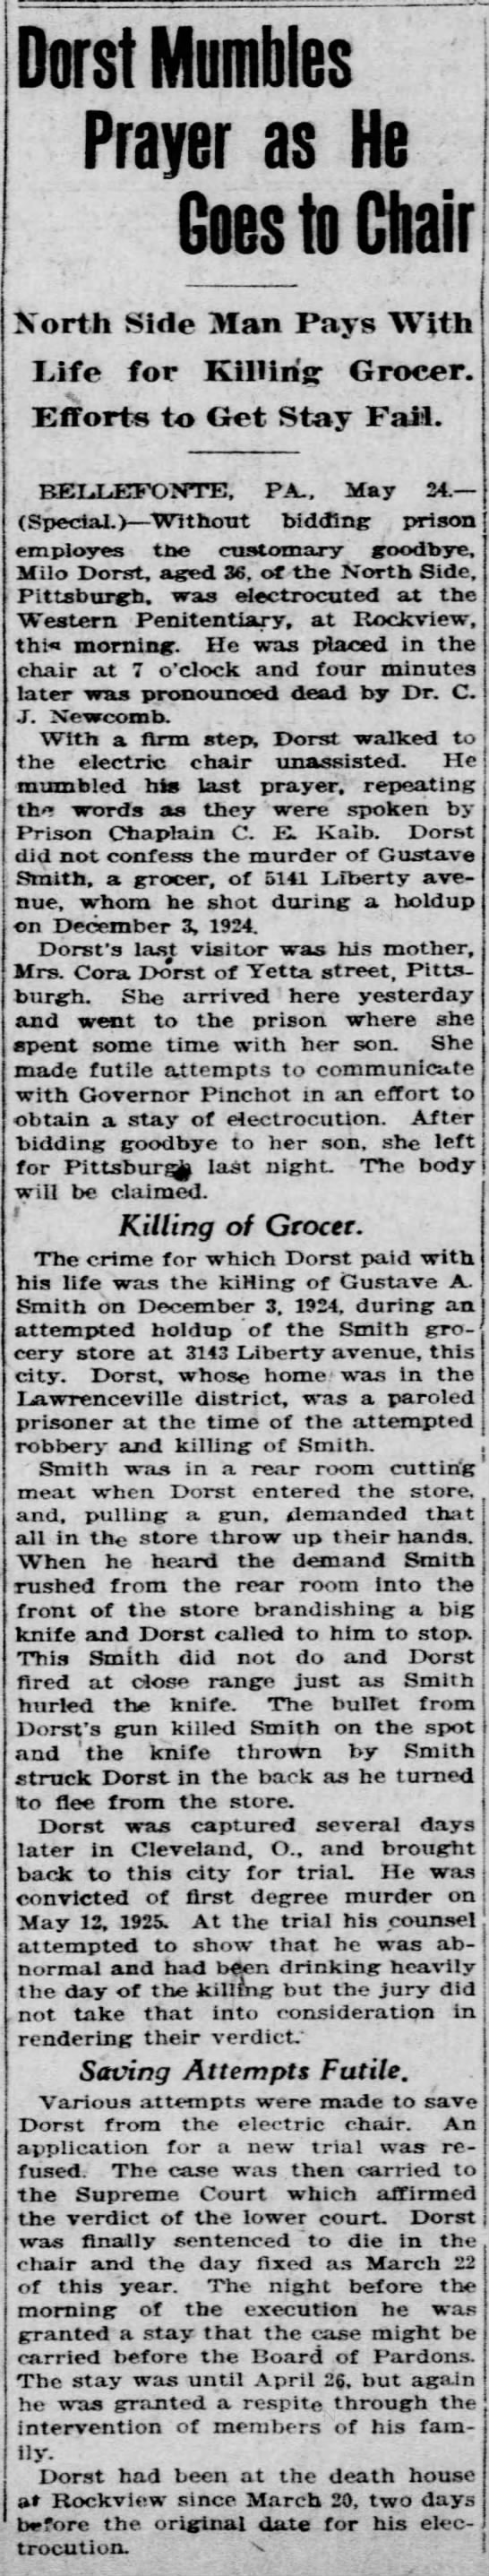 Pittsburgh Gazette, May 25, 1926